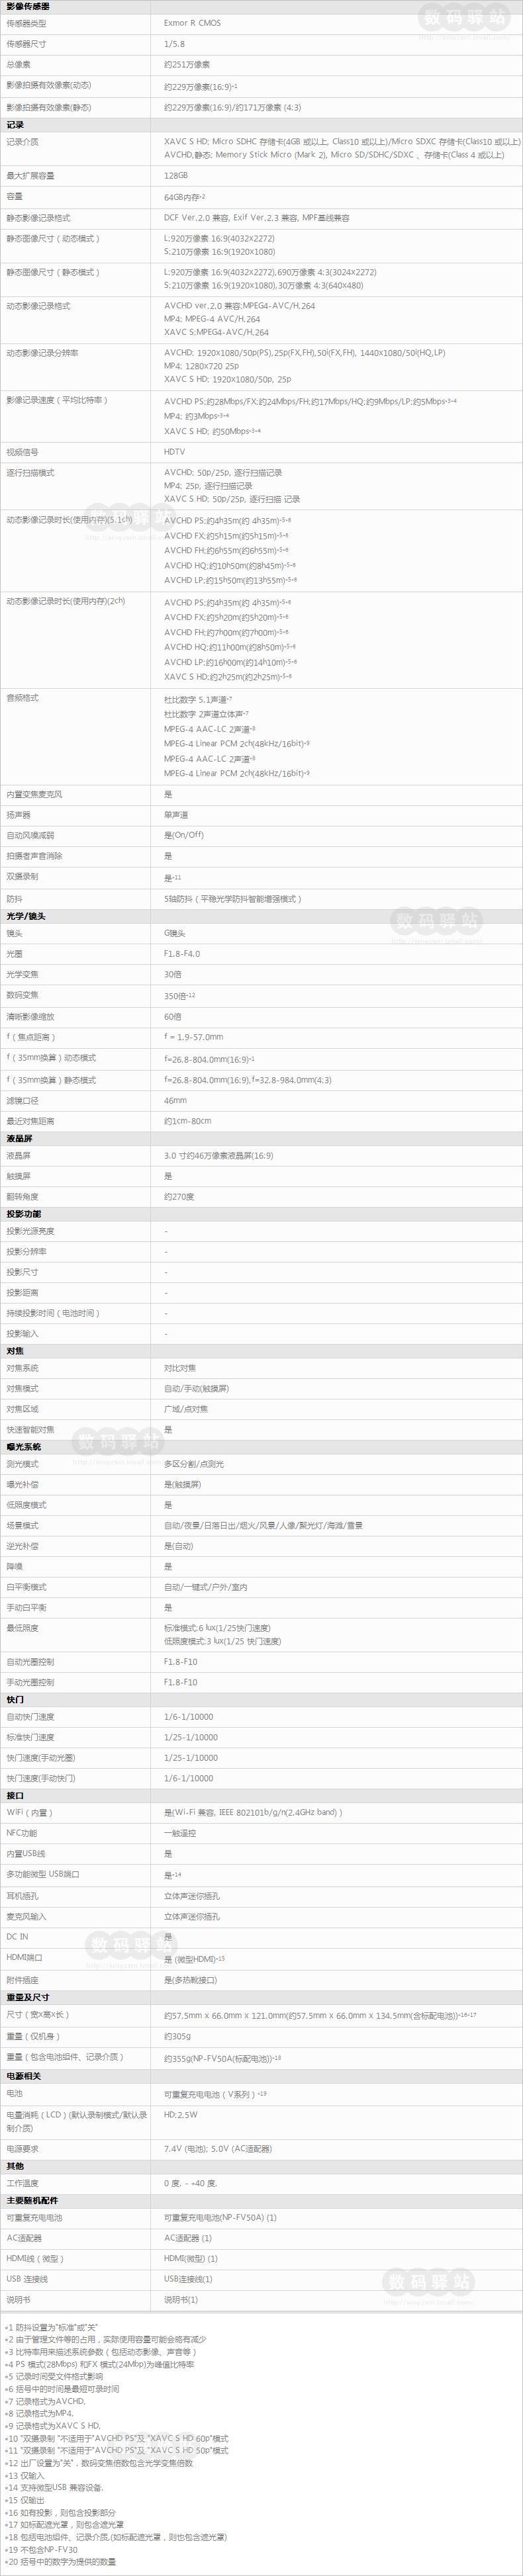 CX680详情介绍.png